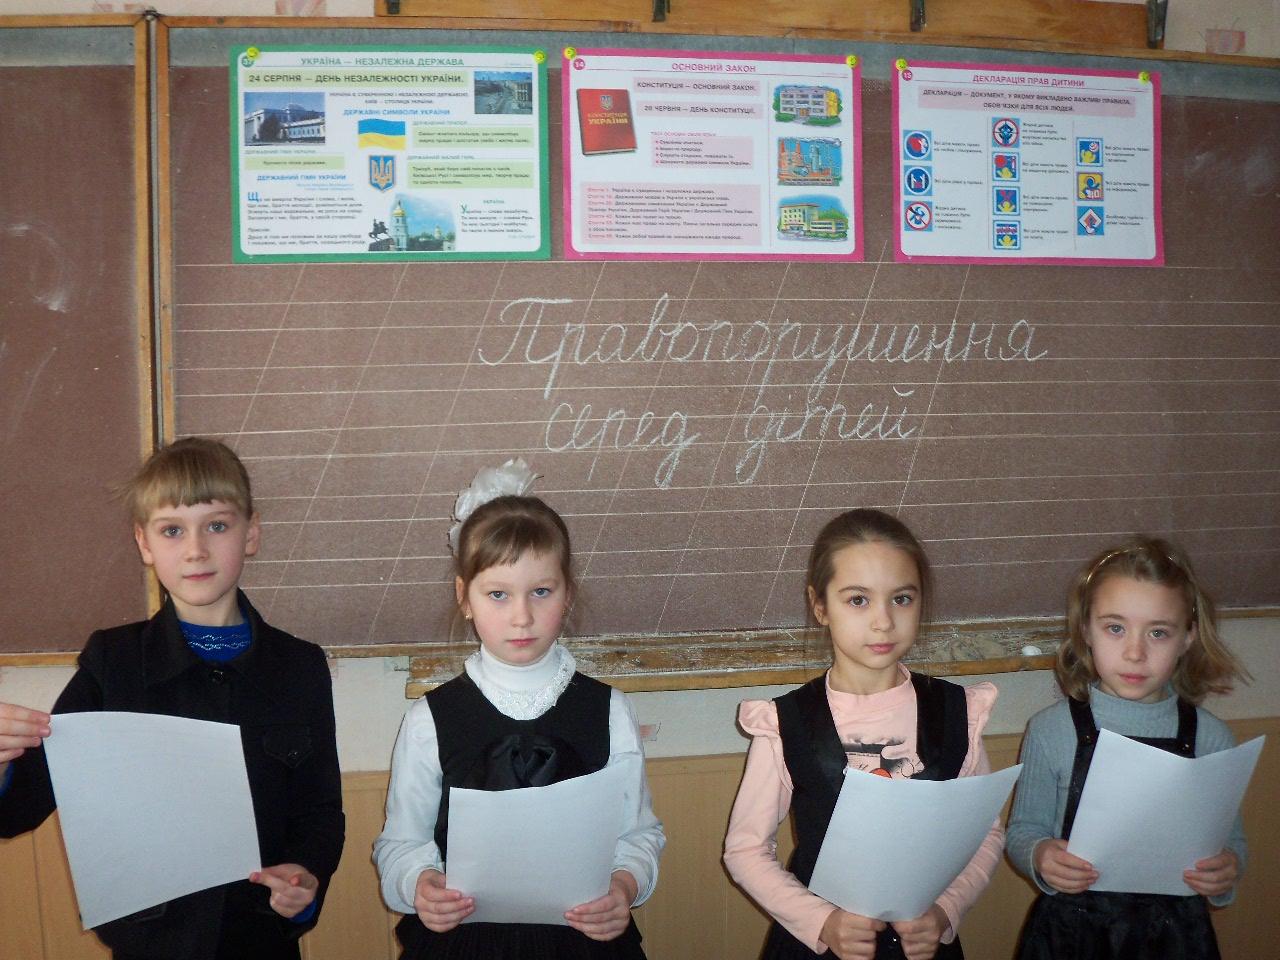 http://karl-gymnasium.at.ua/class_visti/32323233.jpg